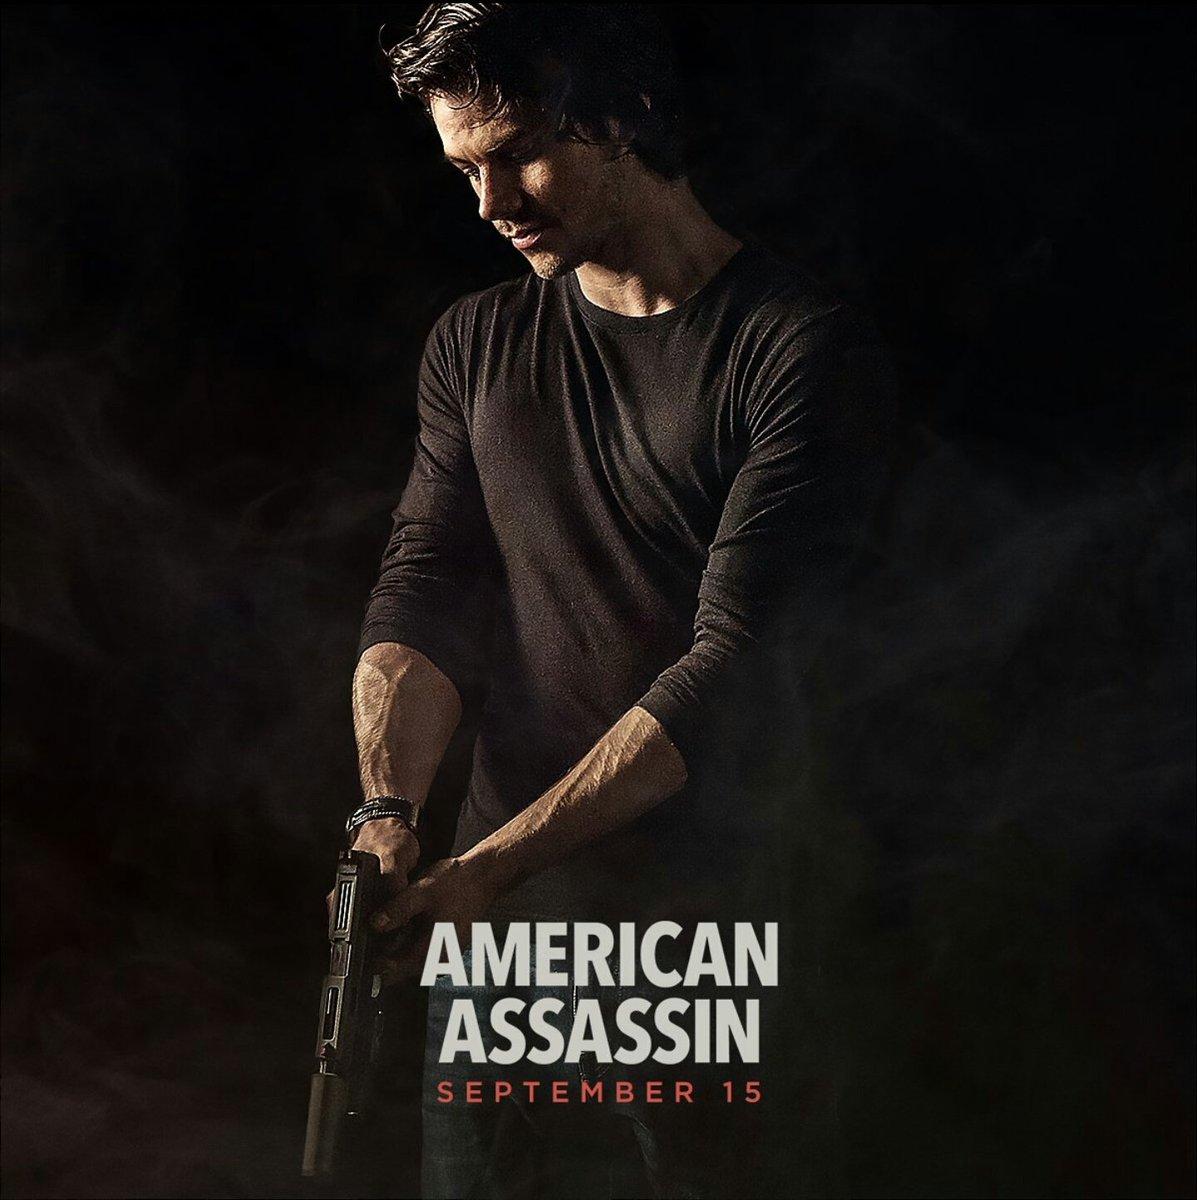 American Assassin (2017) อเมริกัน อัสแซสซินส์